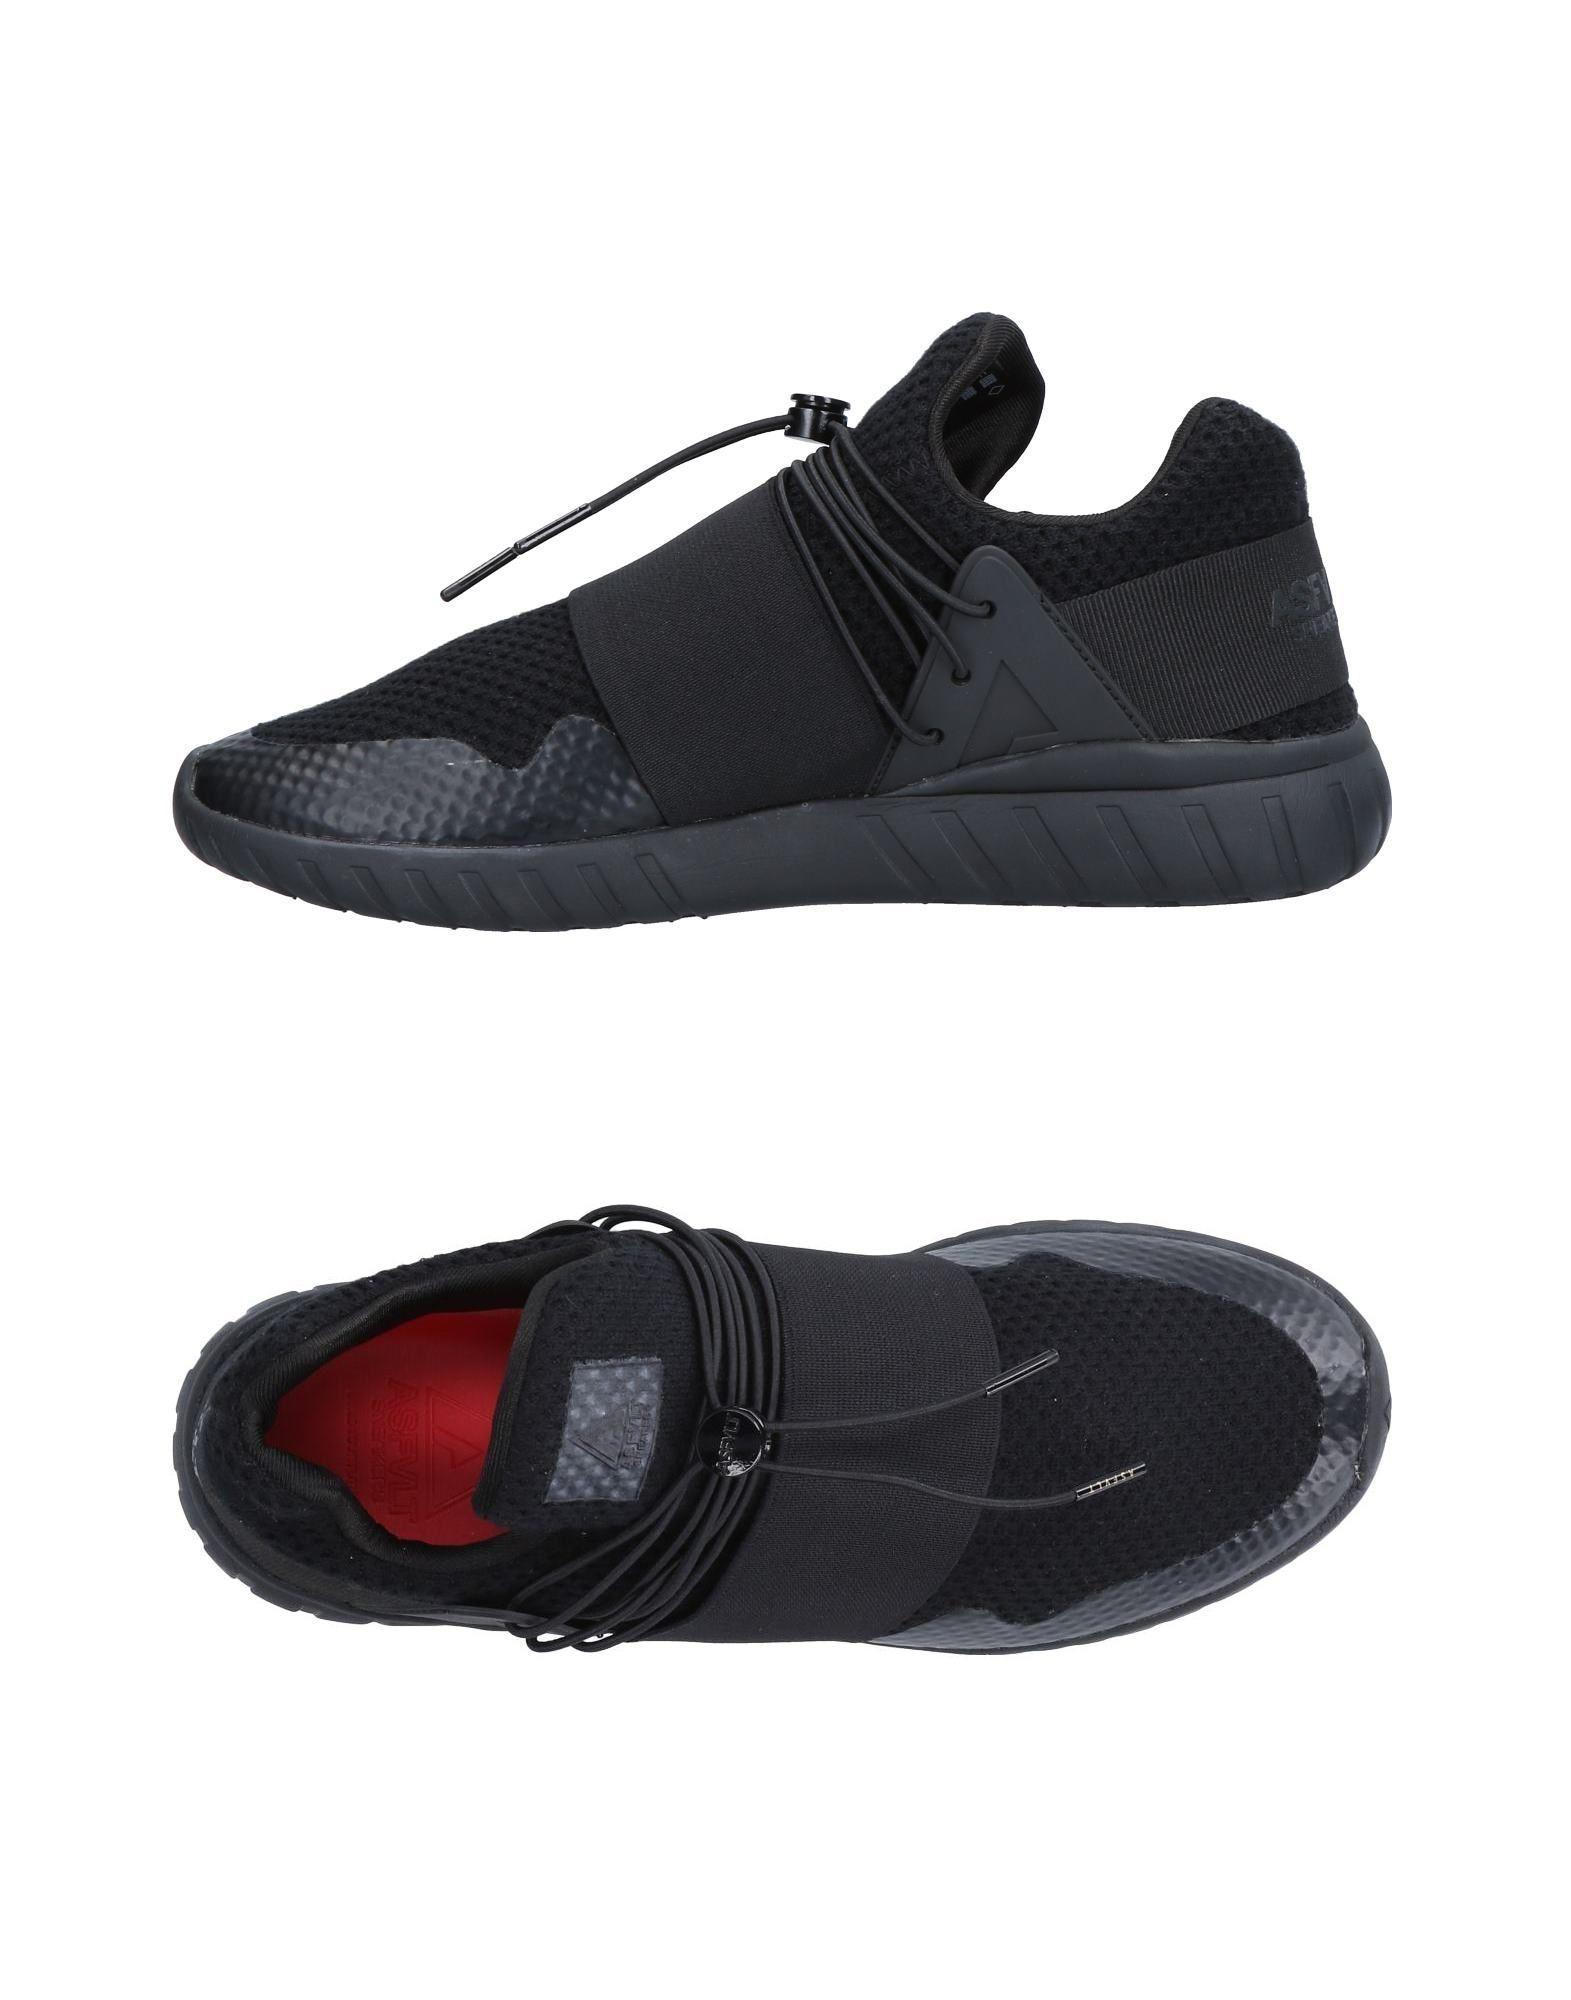 Asfvlt on Sneakers - Men Asfvlt Sneakers online on Asfvlt  Australia - 11506699JE b9d07e